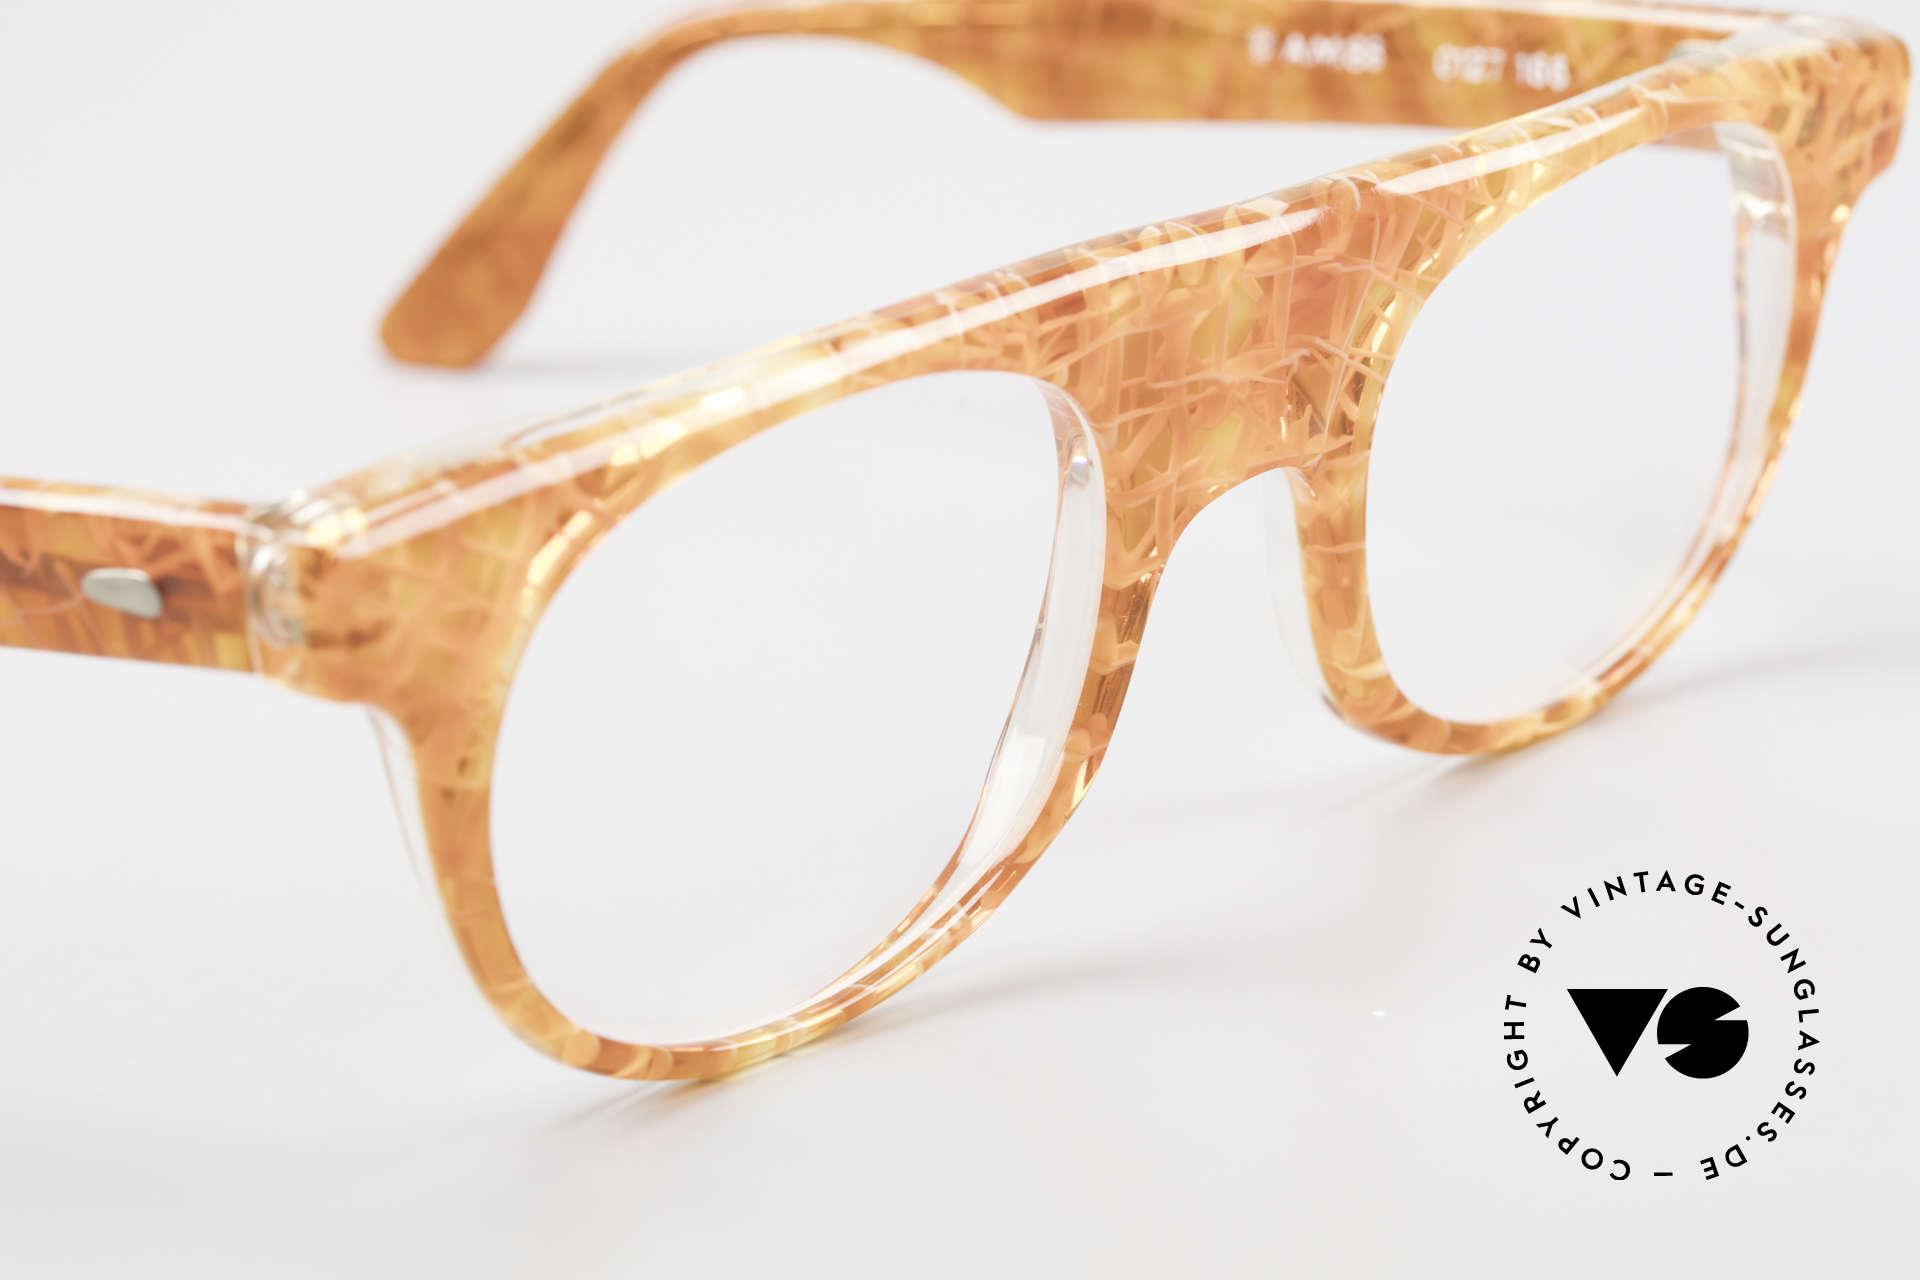 Alain Mikli 0127 / 166 80's Designer Eyeglass-Frame, NO RETRO eyewear, but a unique 35 years old original, Made for Women